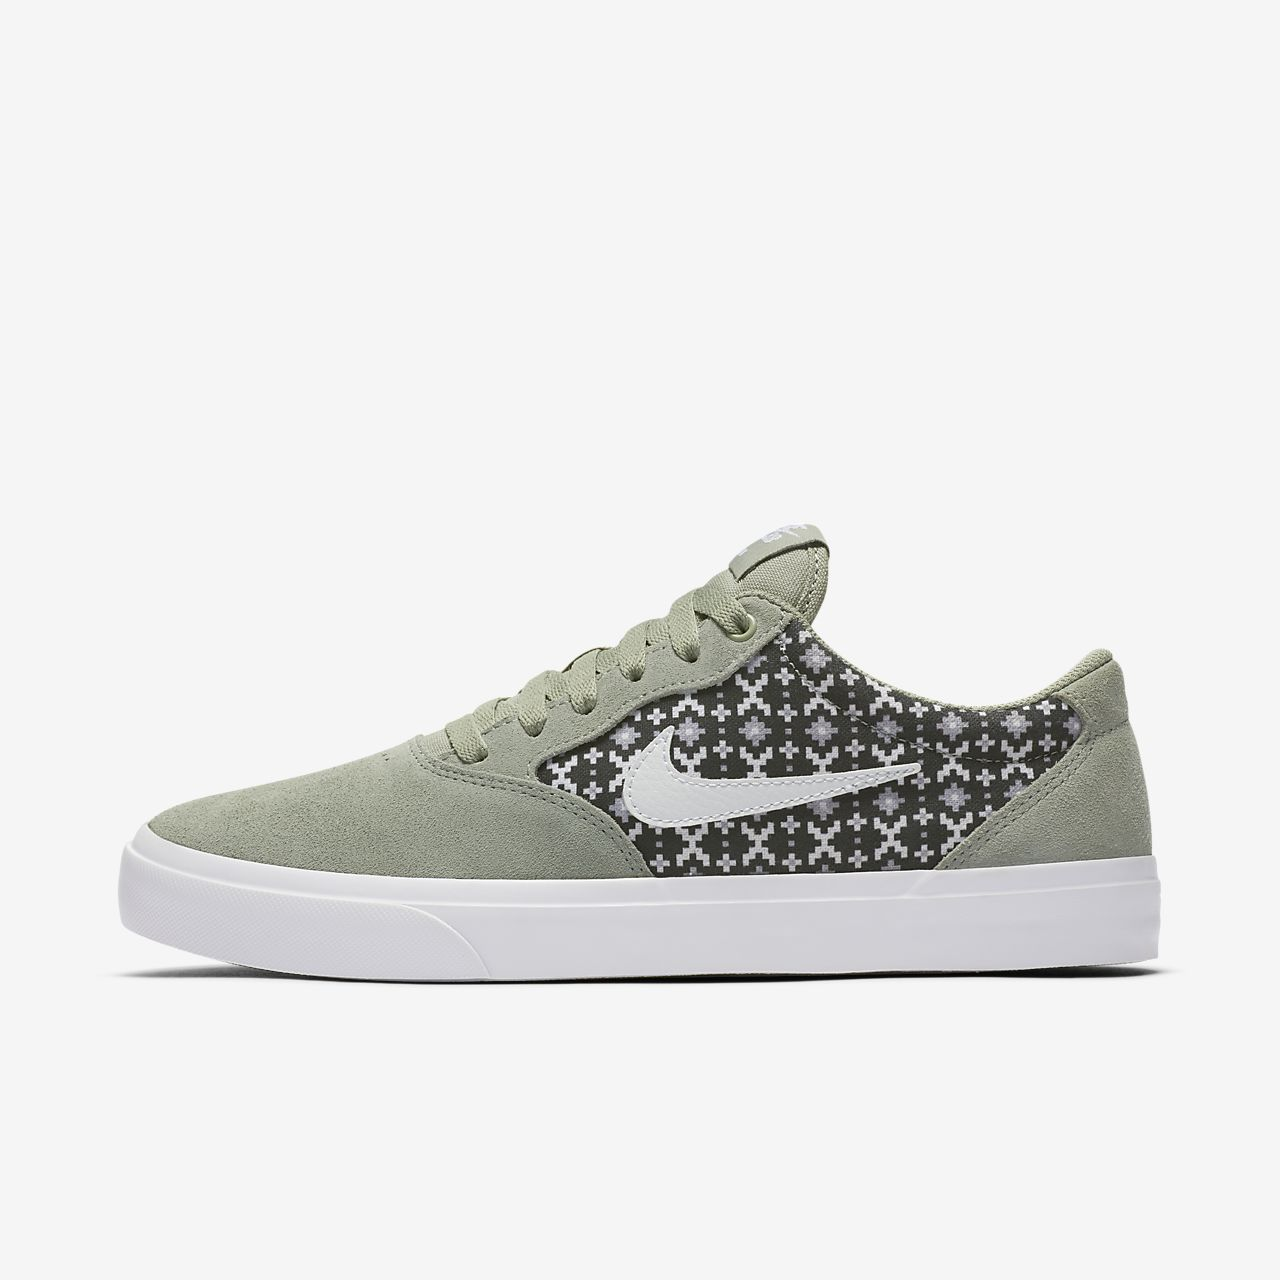 Nike SB Chron Solarsoft Premium Zapatillas de skateboard